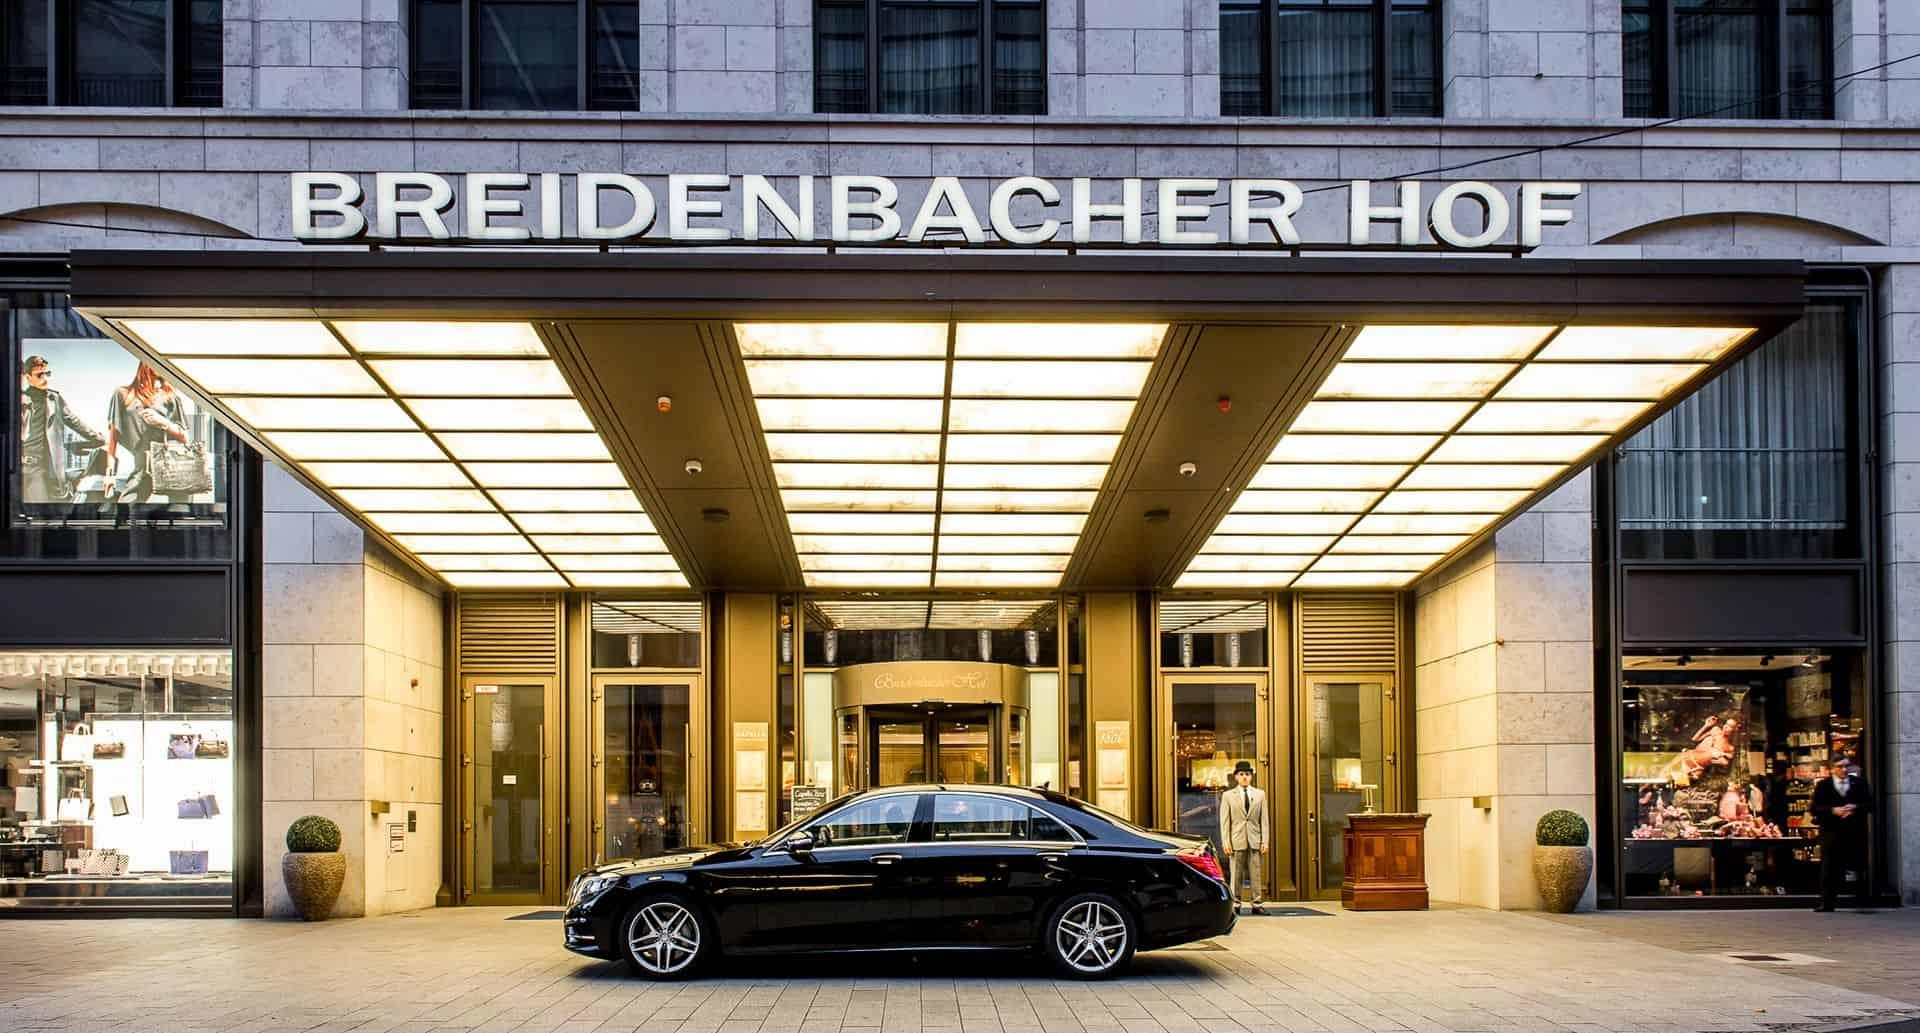 Capella Breidenbacher Hof Duesseldorf Entrance